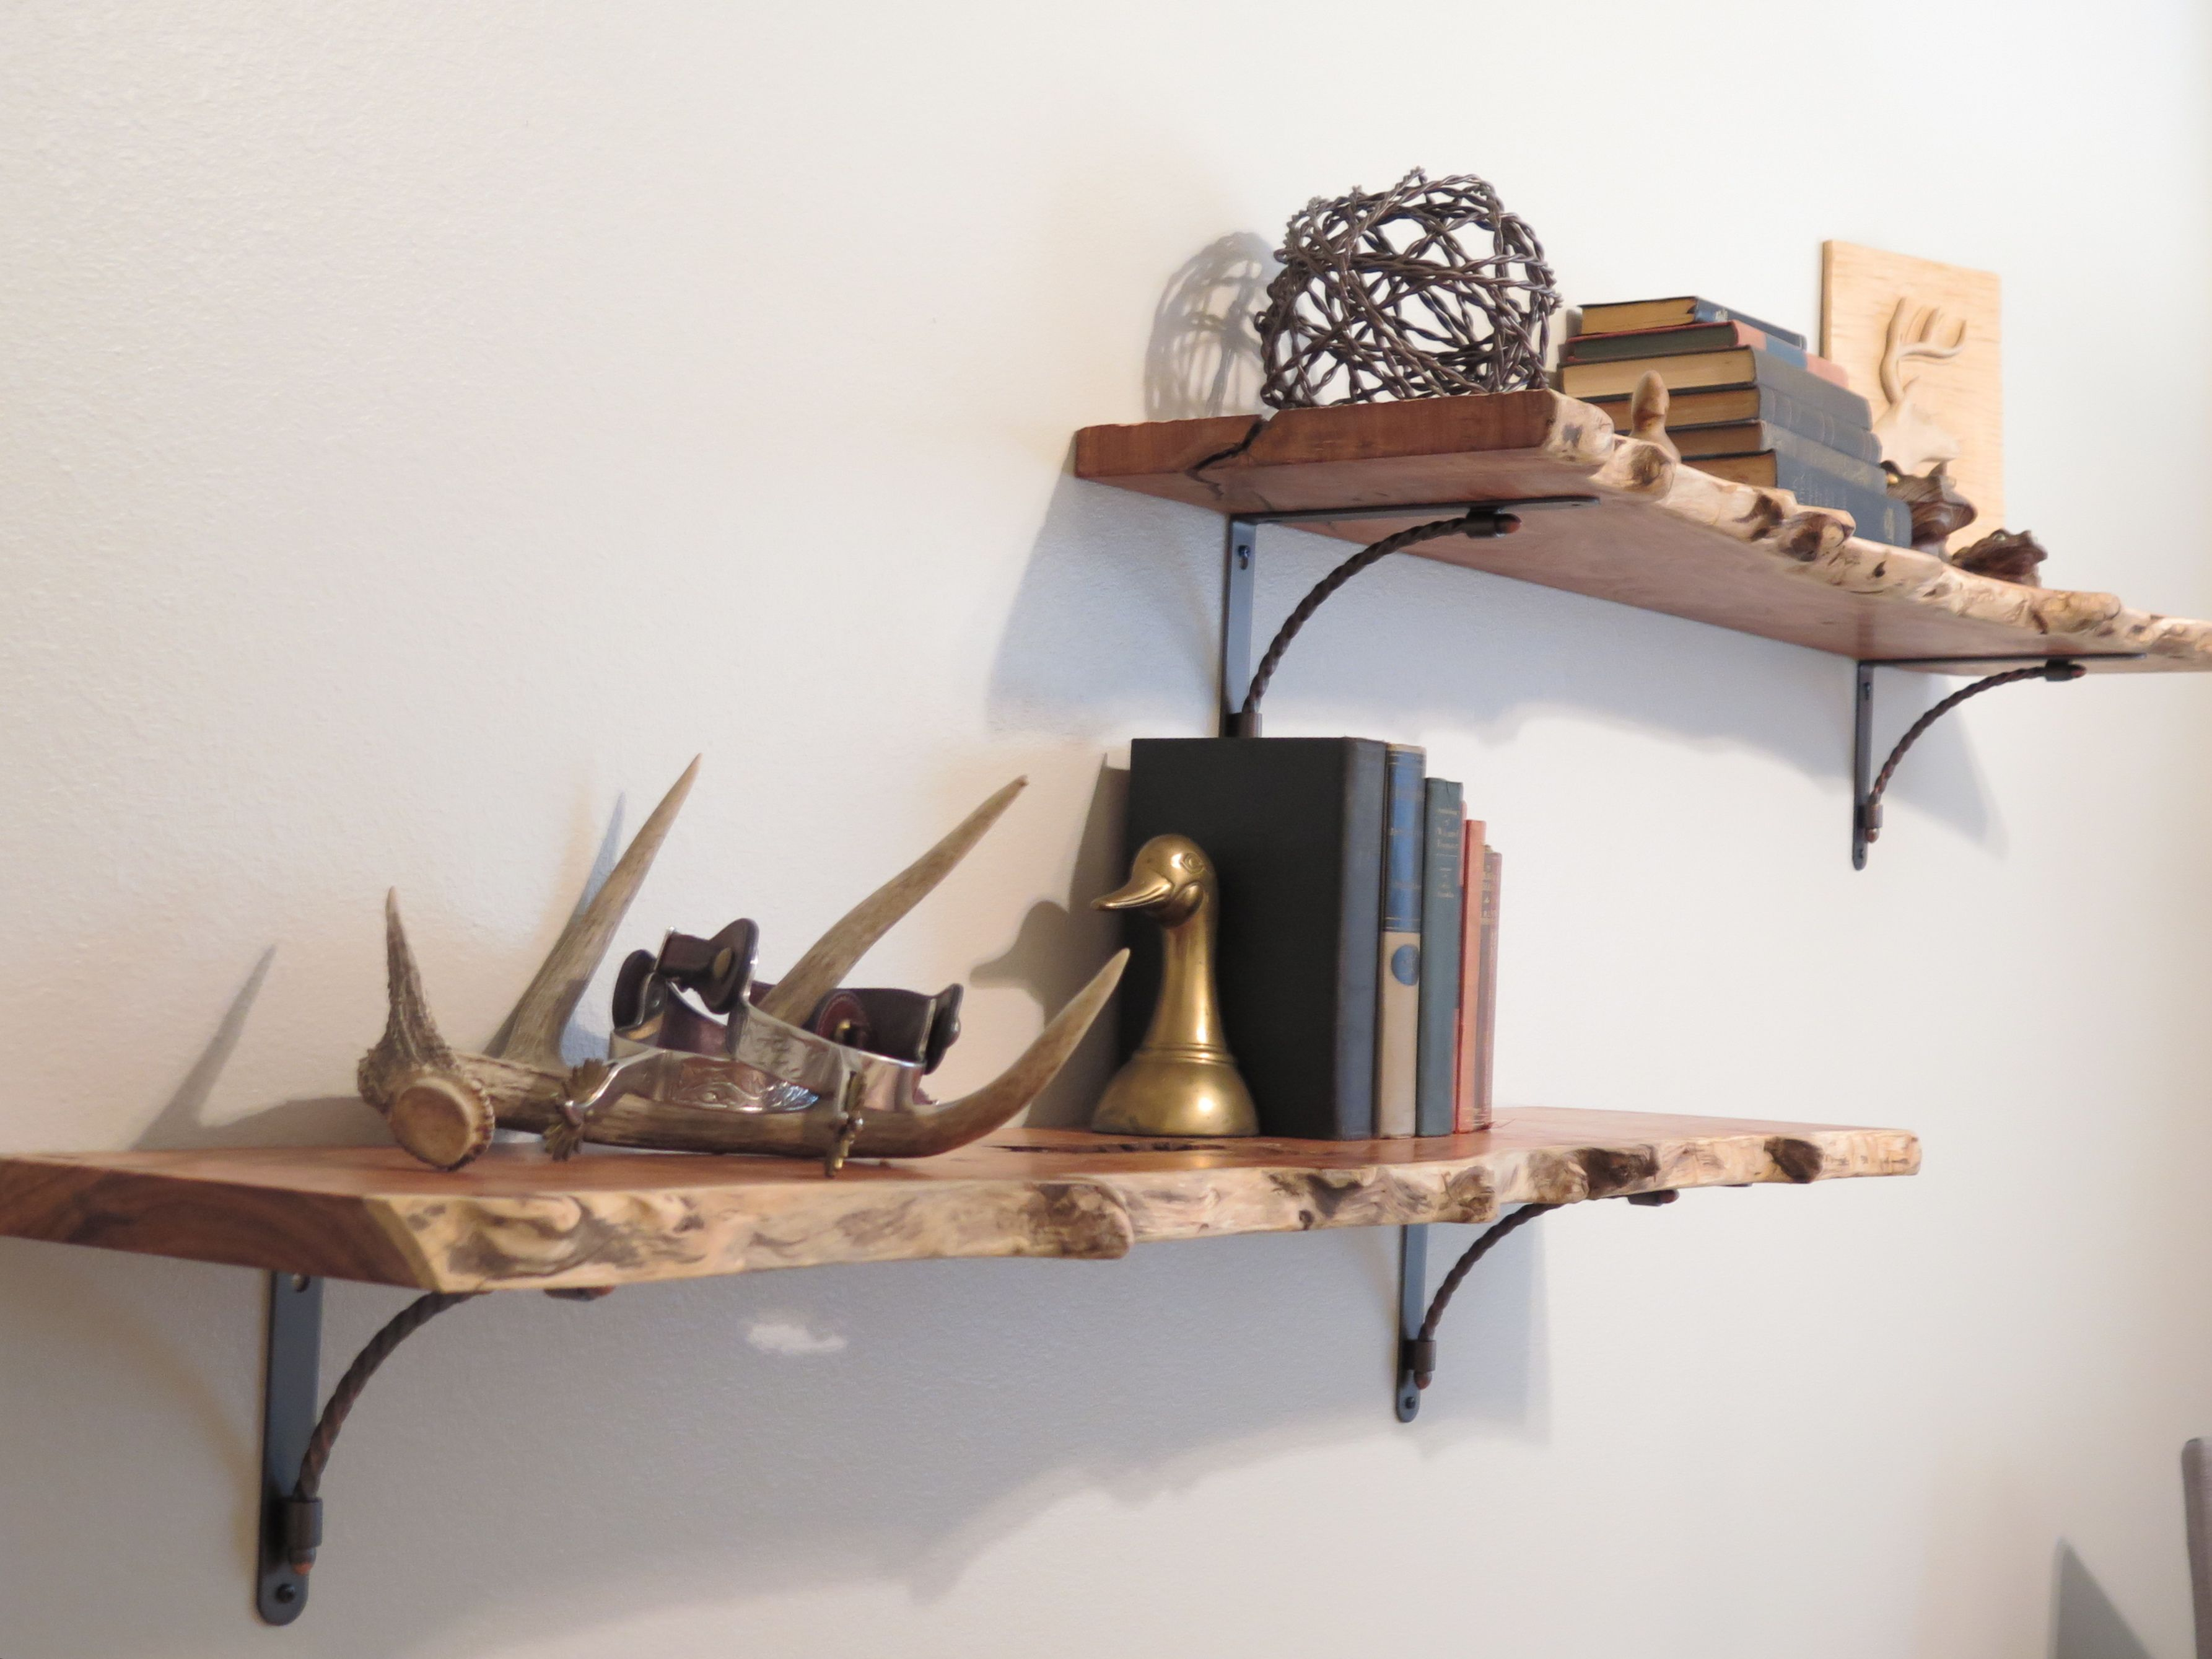 Rustic Nursery: Floating shelves, raw edge mesquite wood | Jack ...